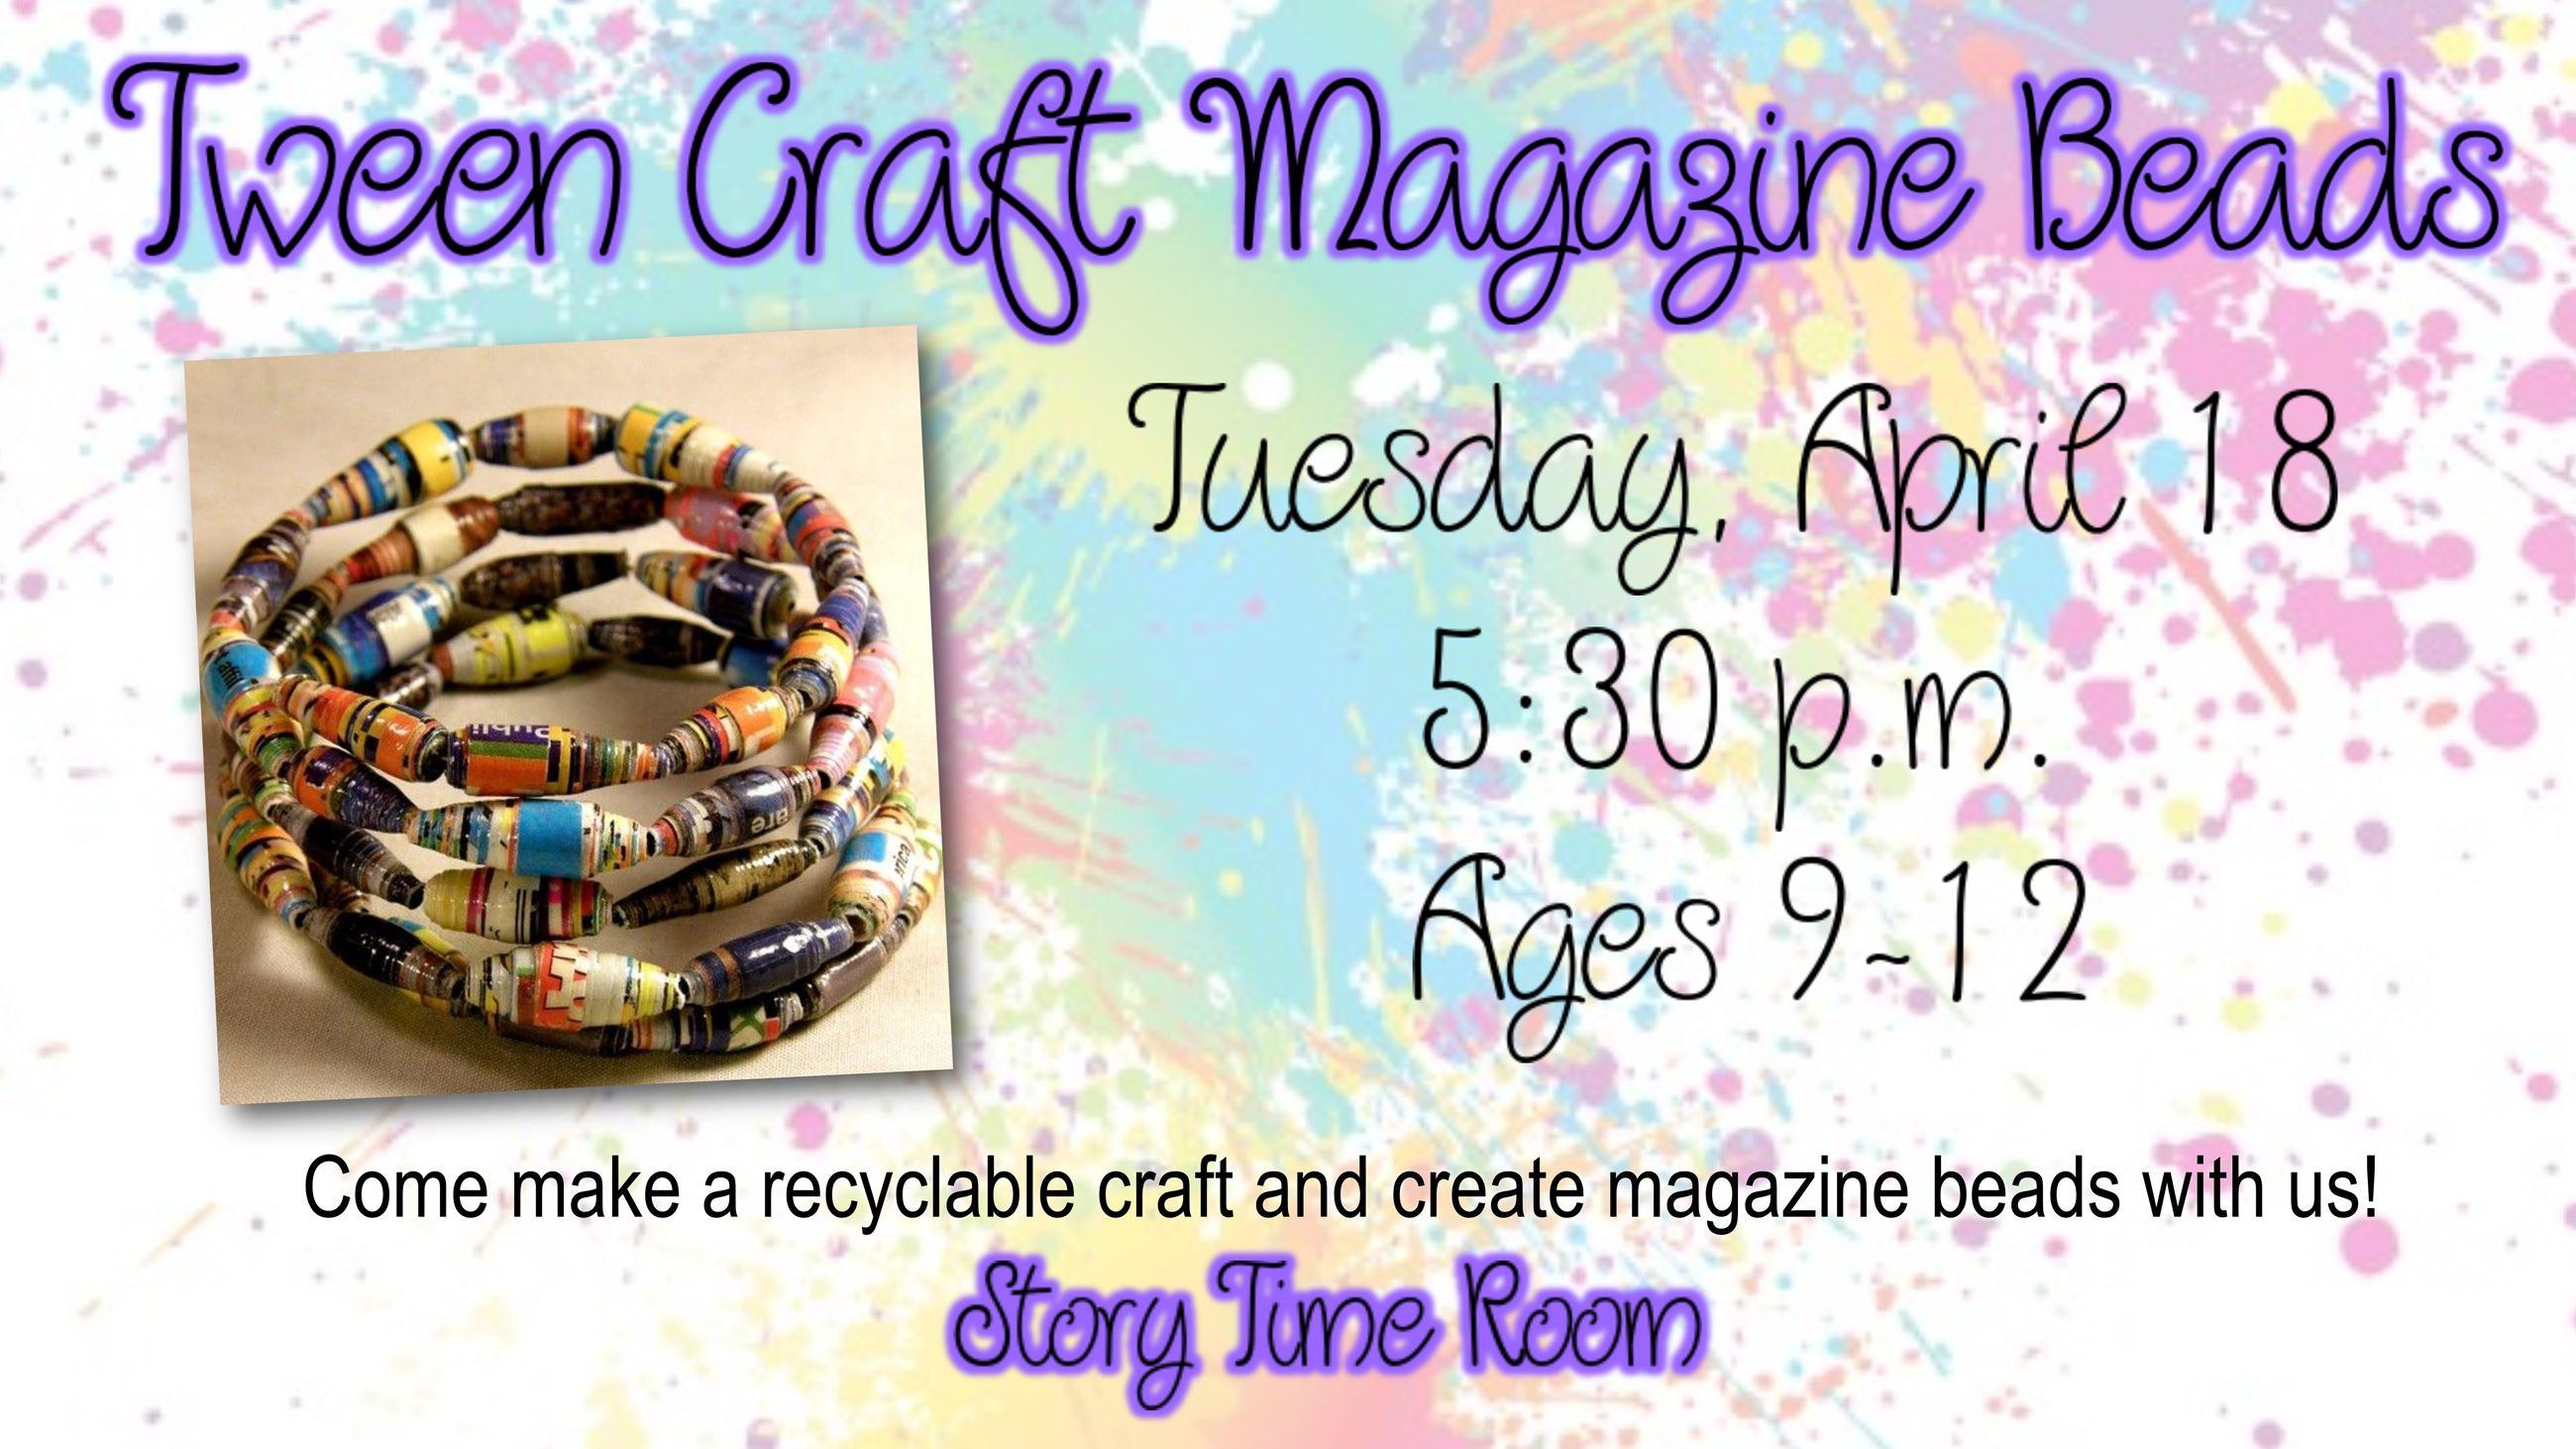 Tween Craft Magazine Beads